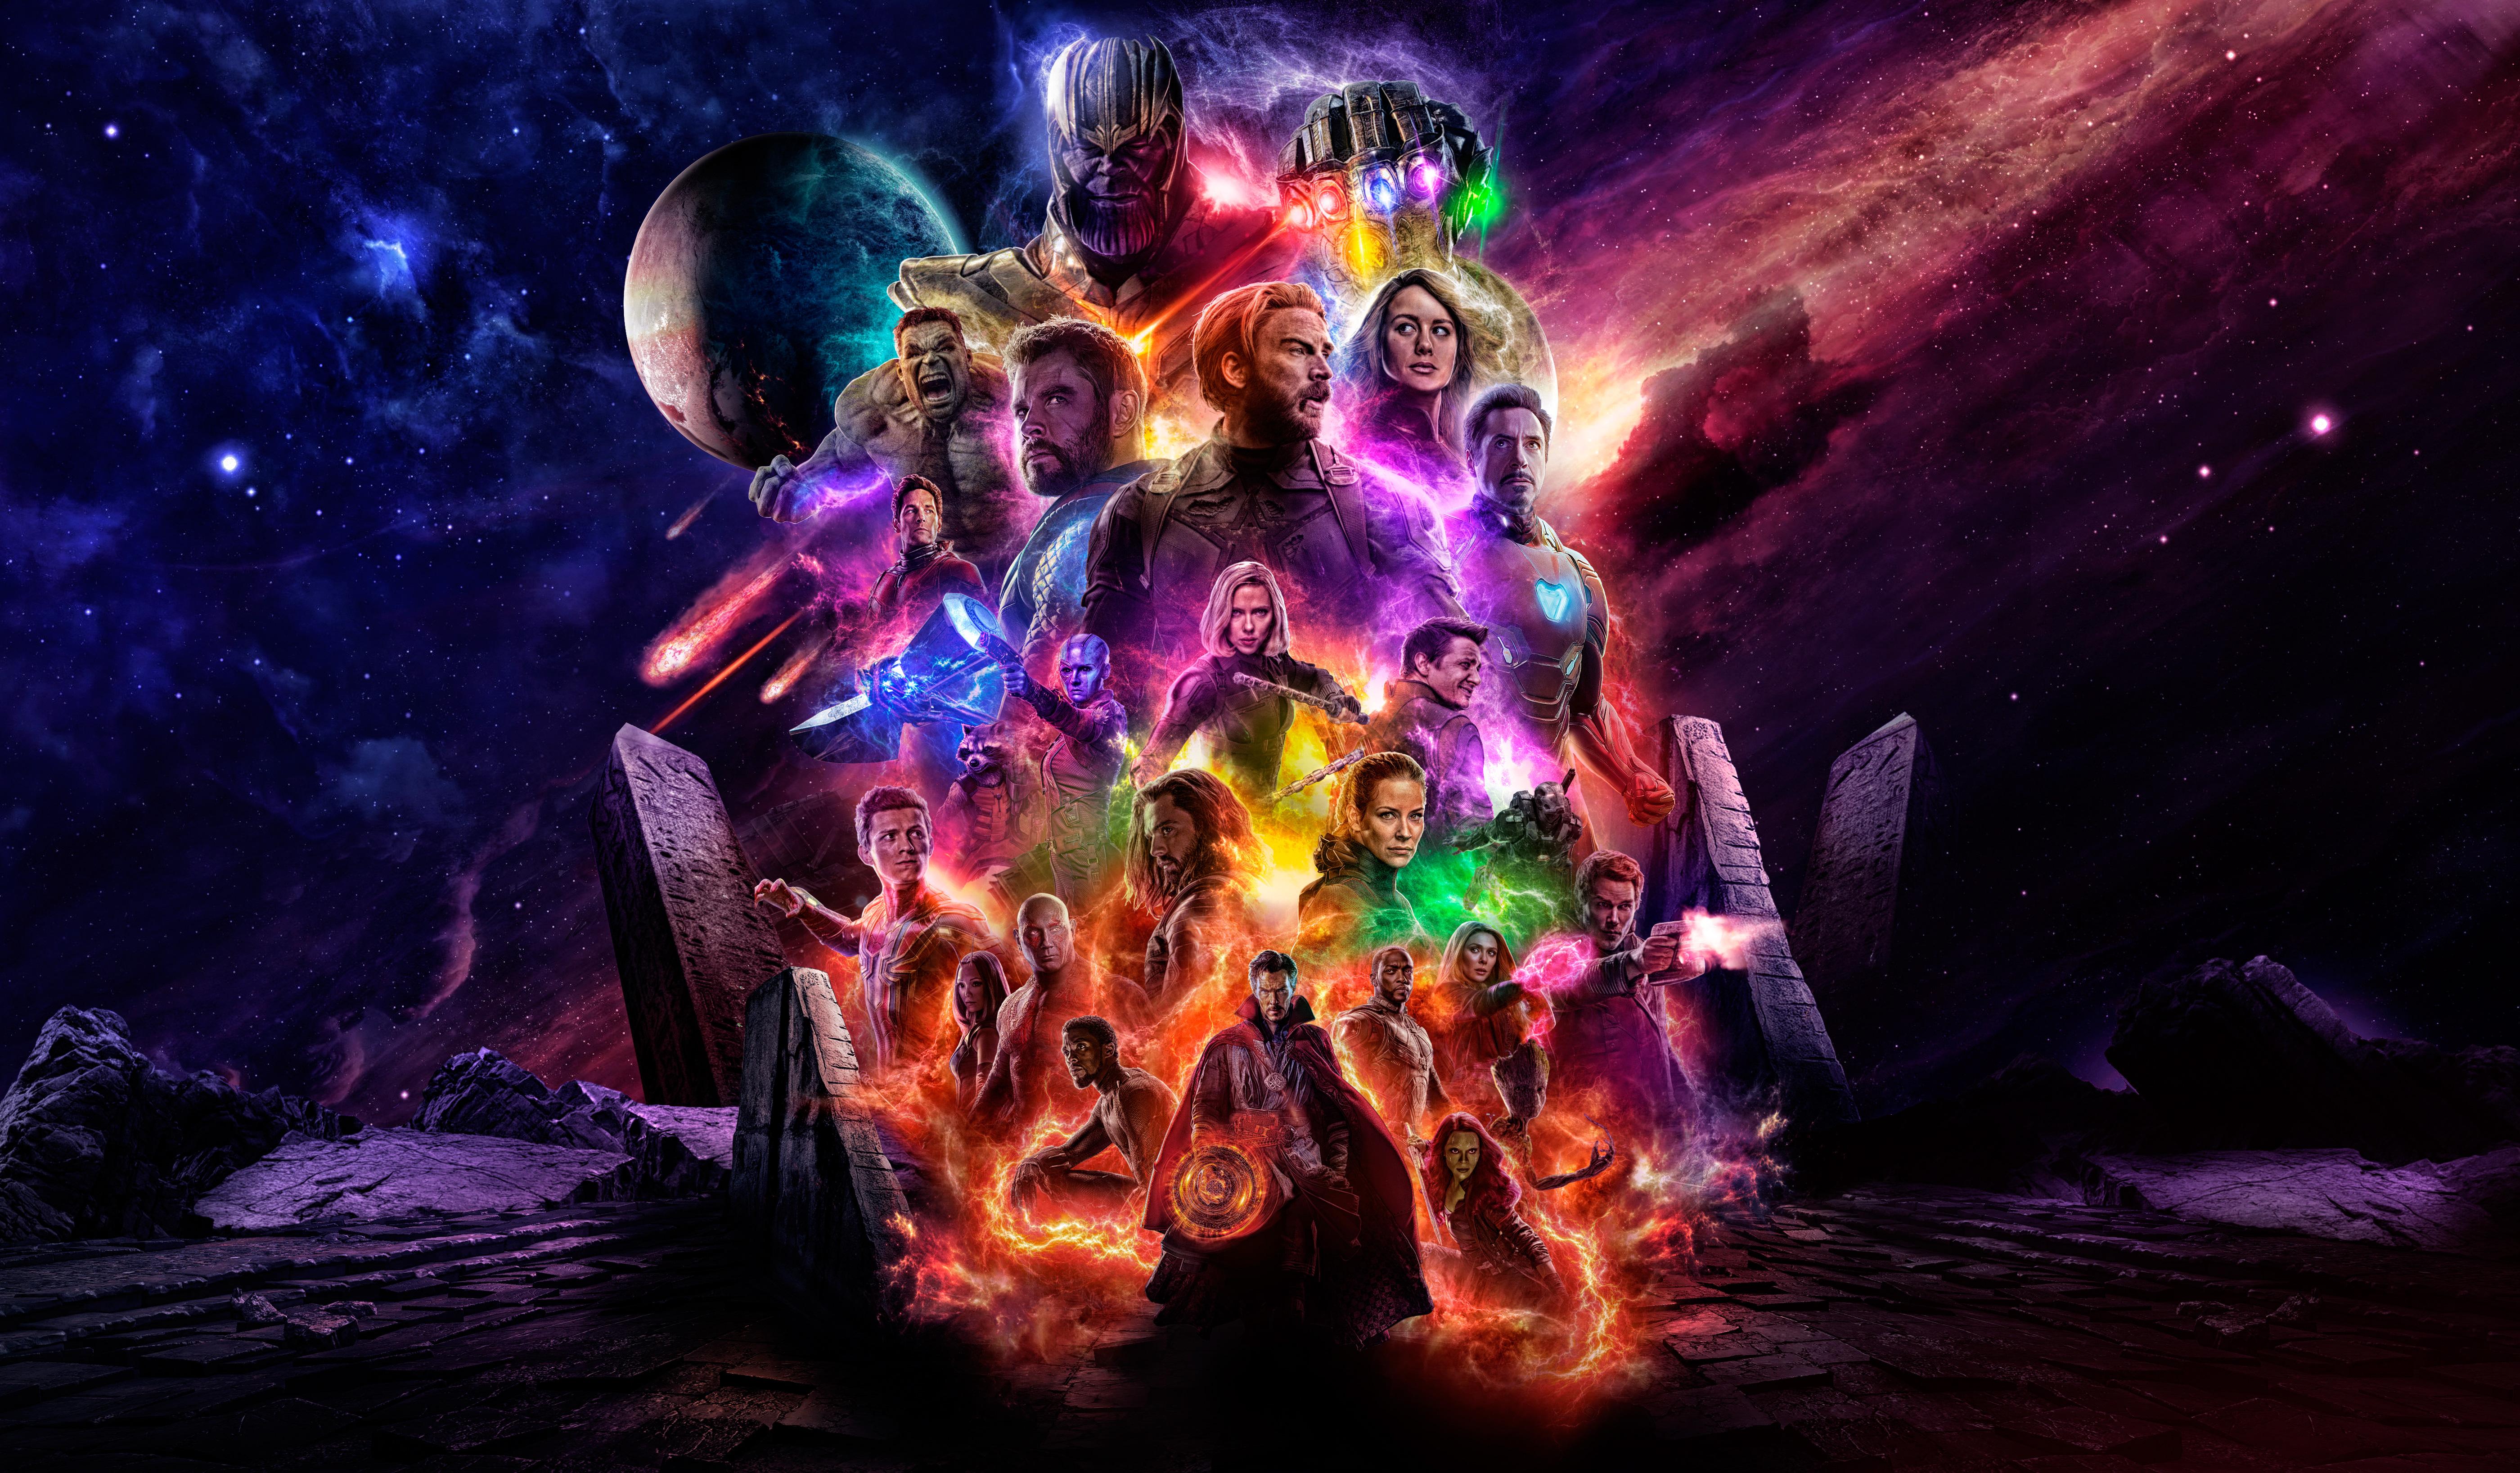 Avengers 4 Offical Poster Artwork 2019 5k Hd Movies 4k Wallpapers